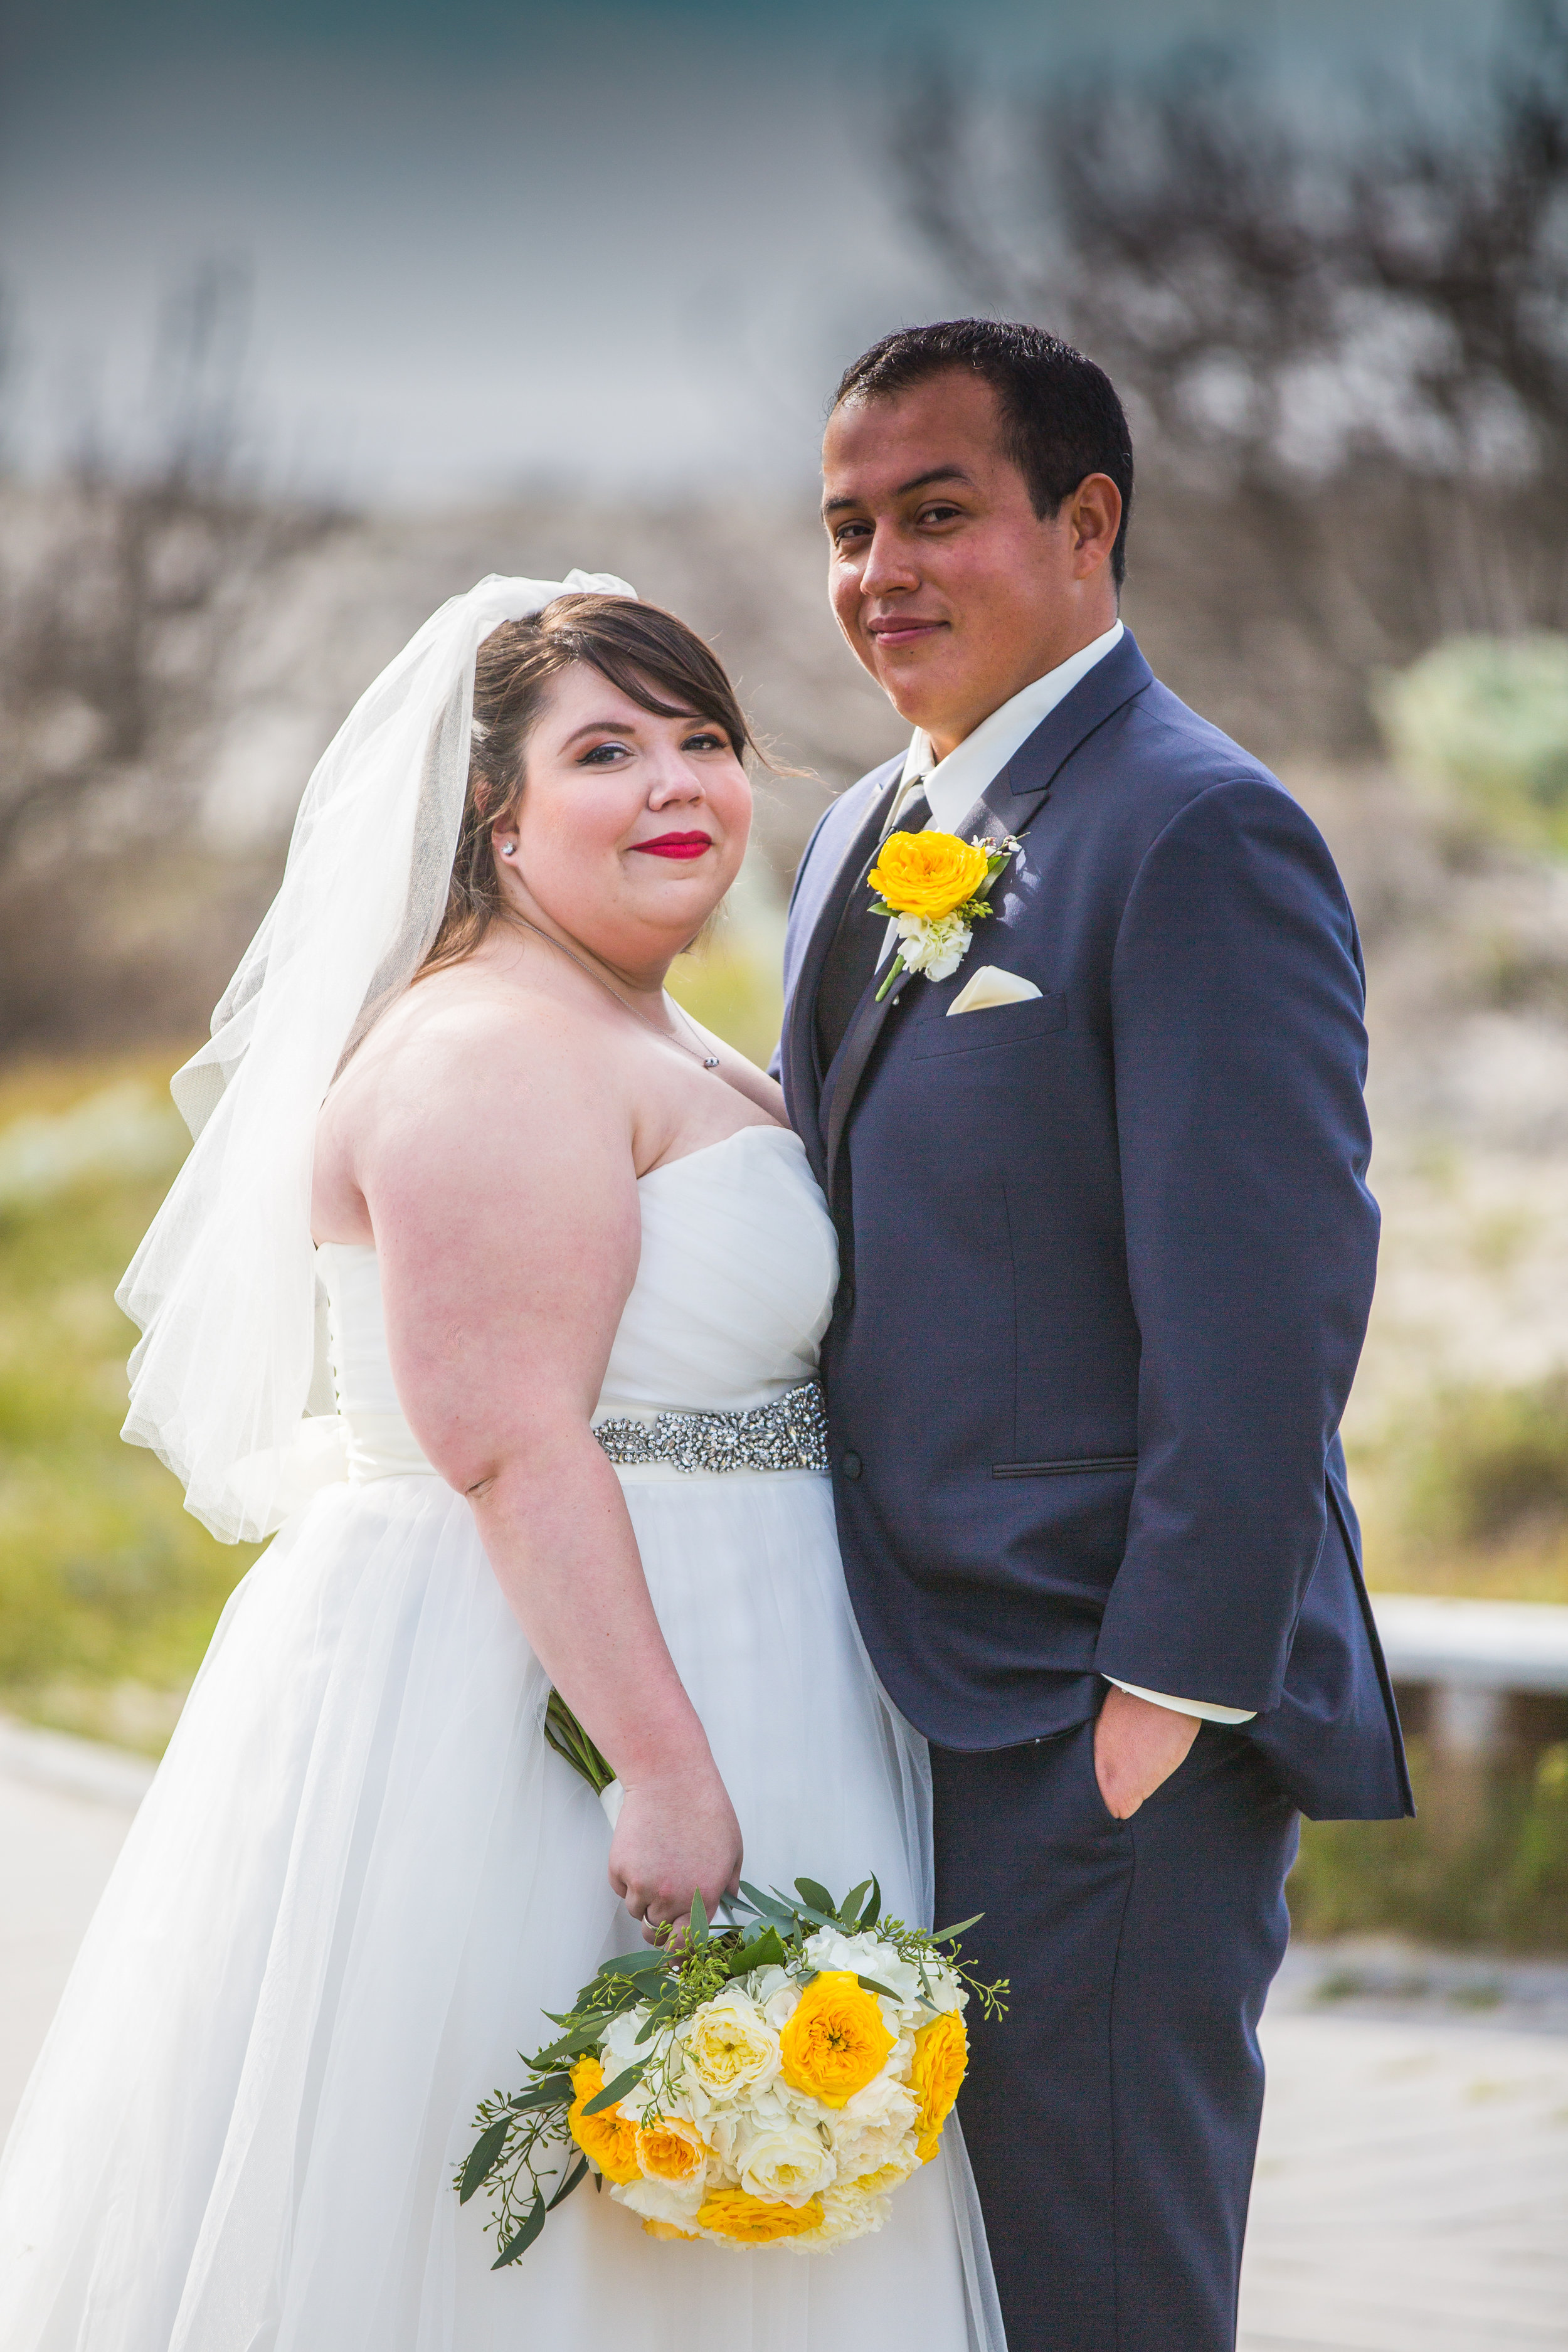 Toshi Tazawa Photography San Francisco CA Destination Wedding Photographer-15.jpg